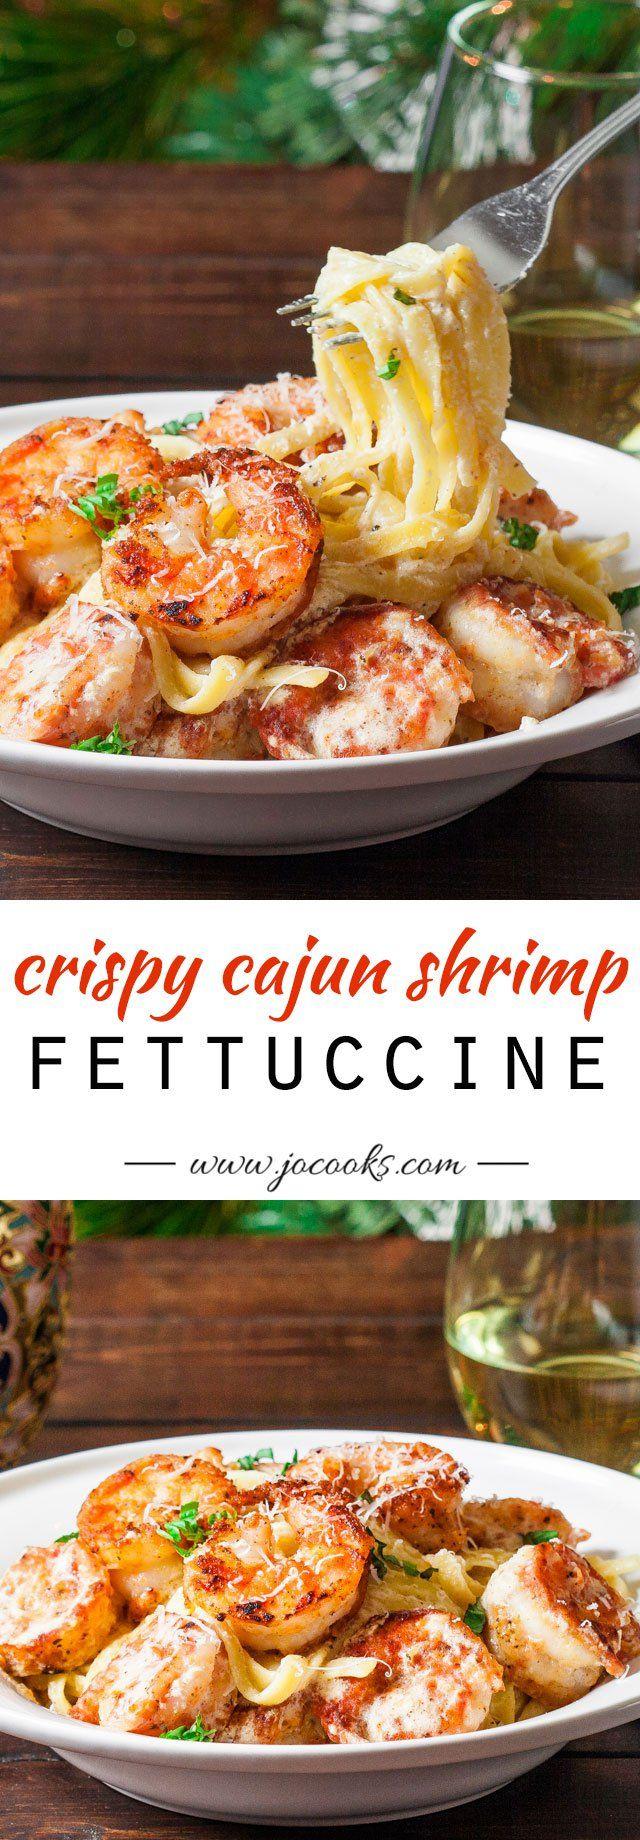 Nz fish species tea towel 12 00 the seafood new zealand tea towel - Crispy Cajun Shrimp Fettuccine With A Super Easy Creamy Sauce And Crispy Cajun Shrimp That Can